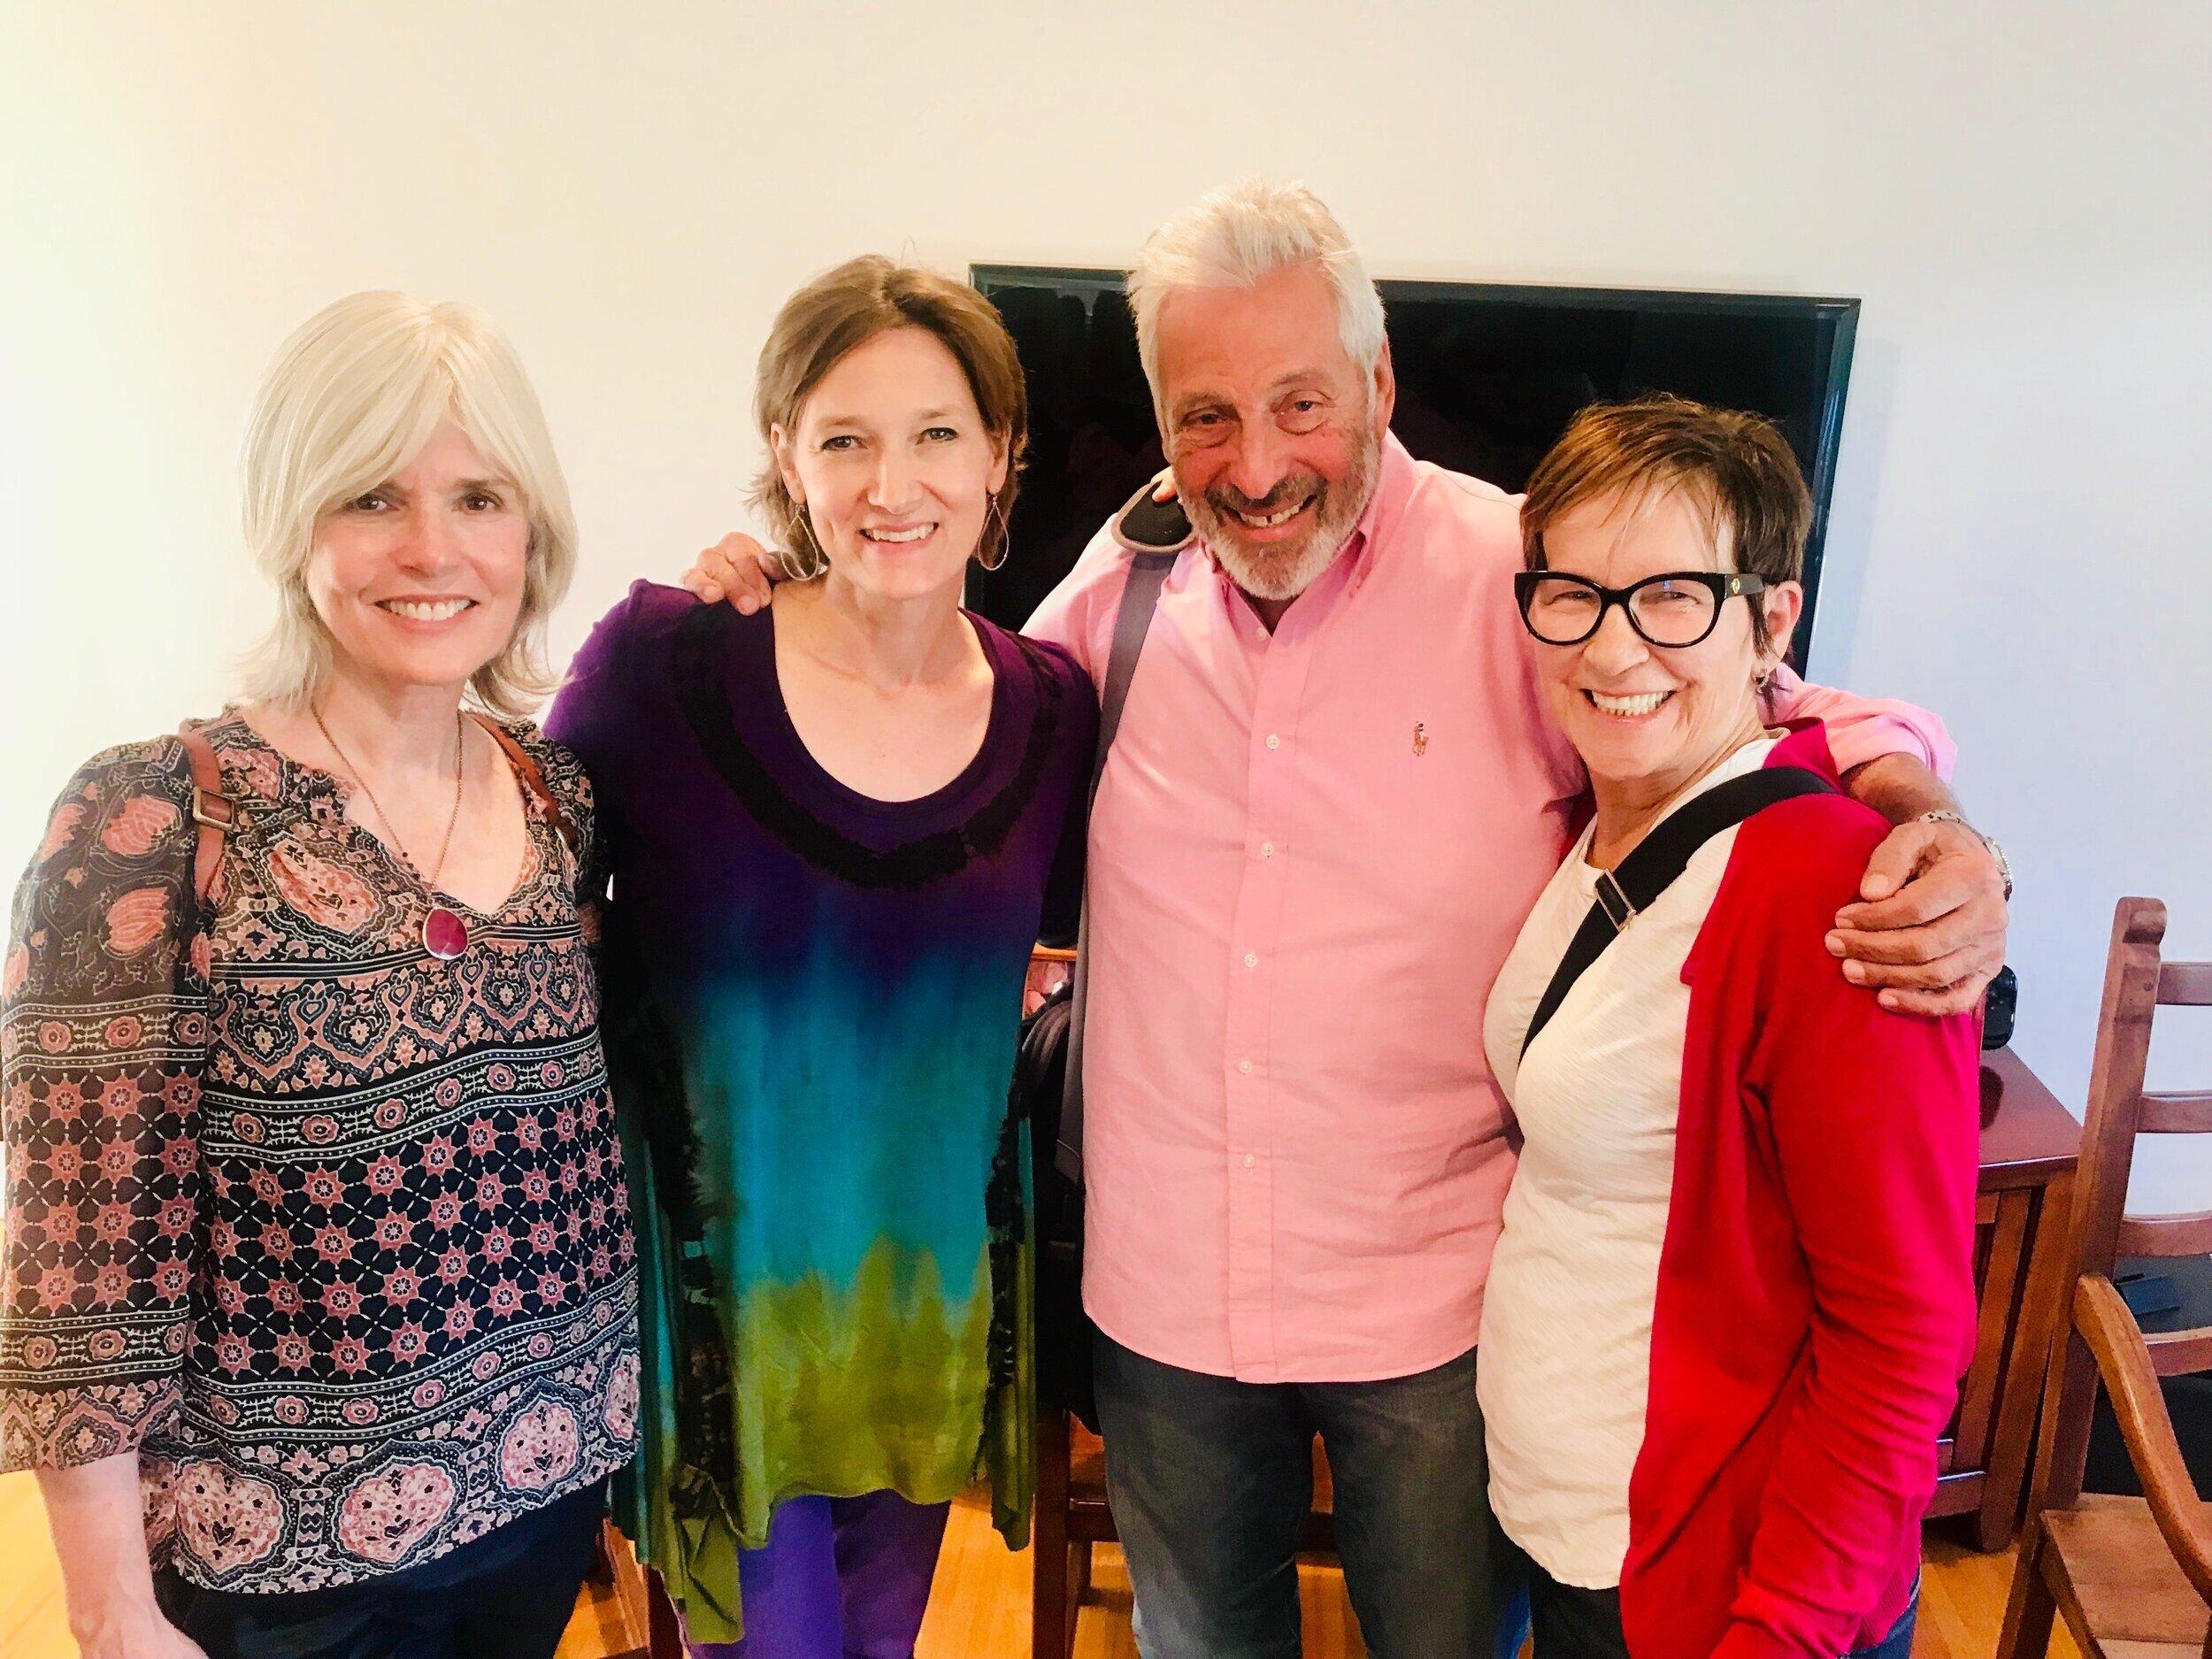 Molly Jordan, Karin Gutman, Hawk Koch and Wendy Adamson